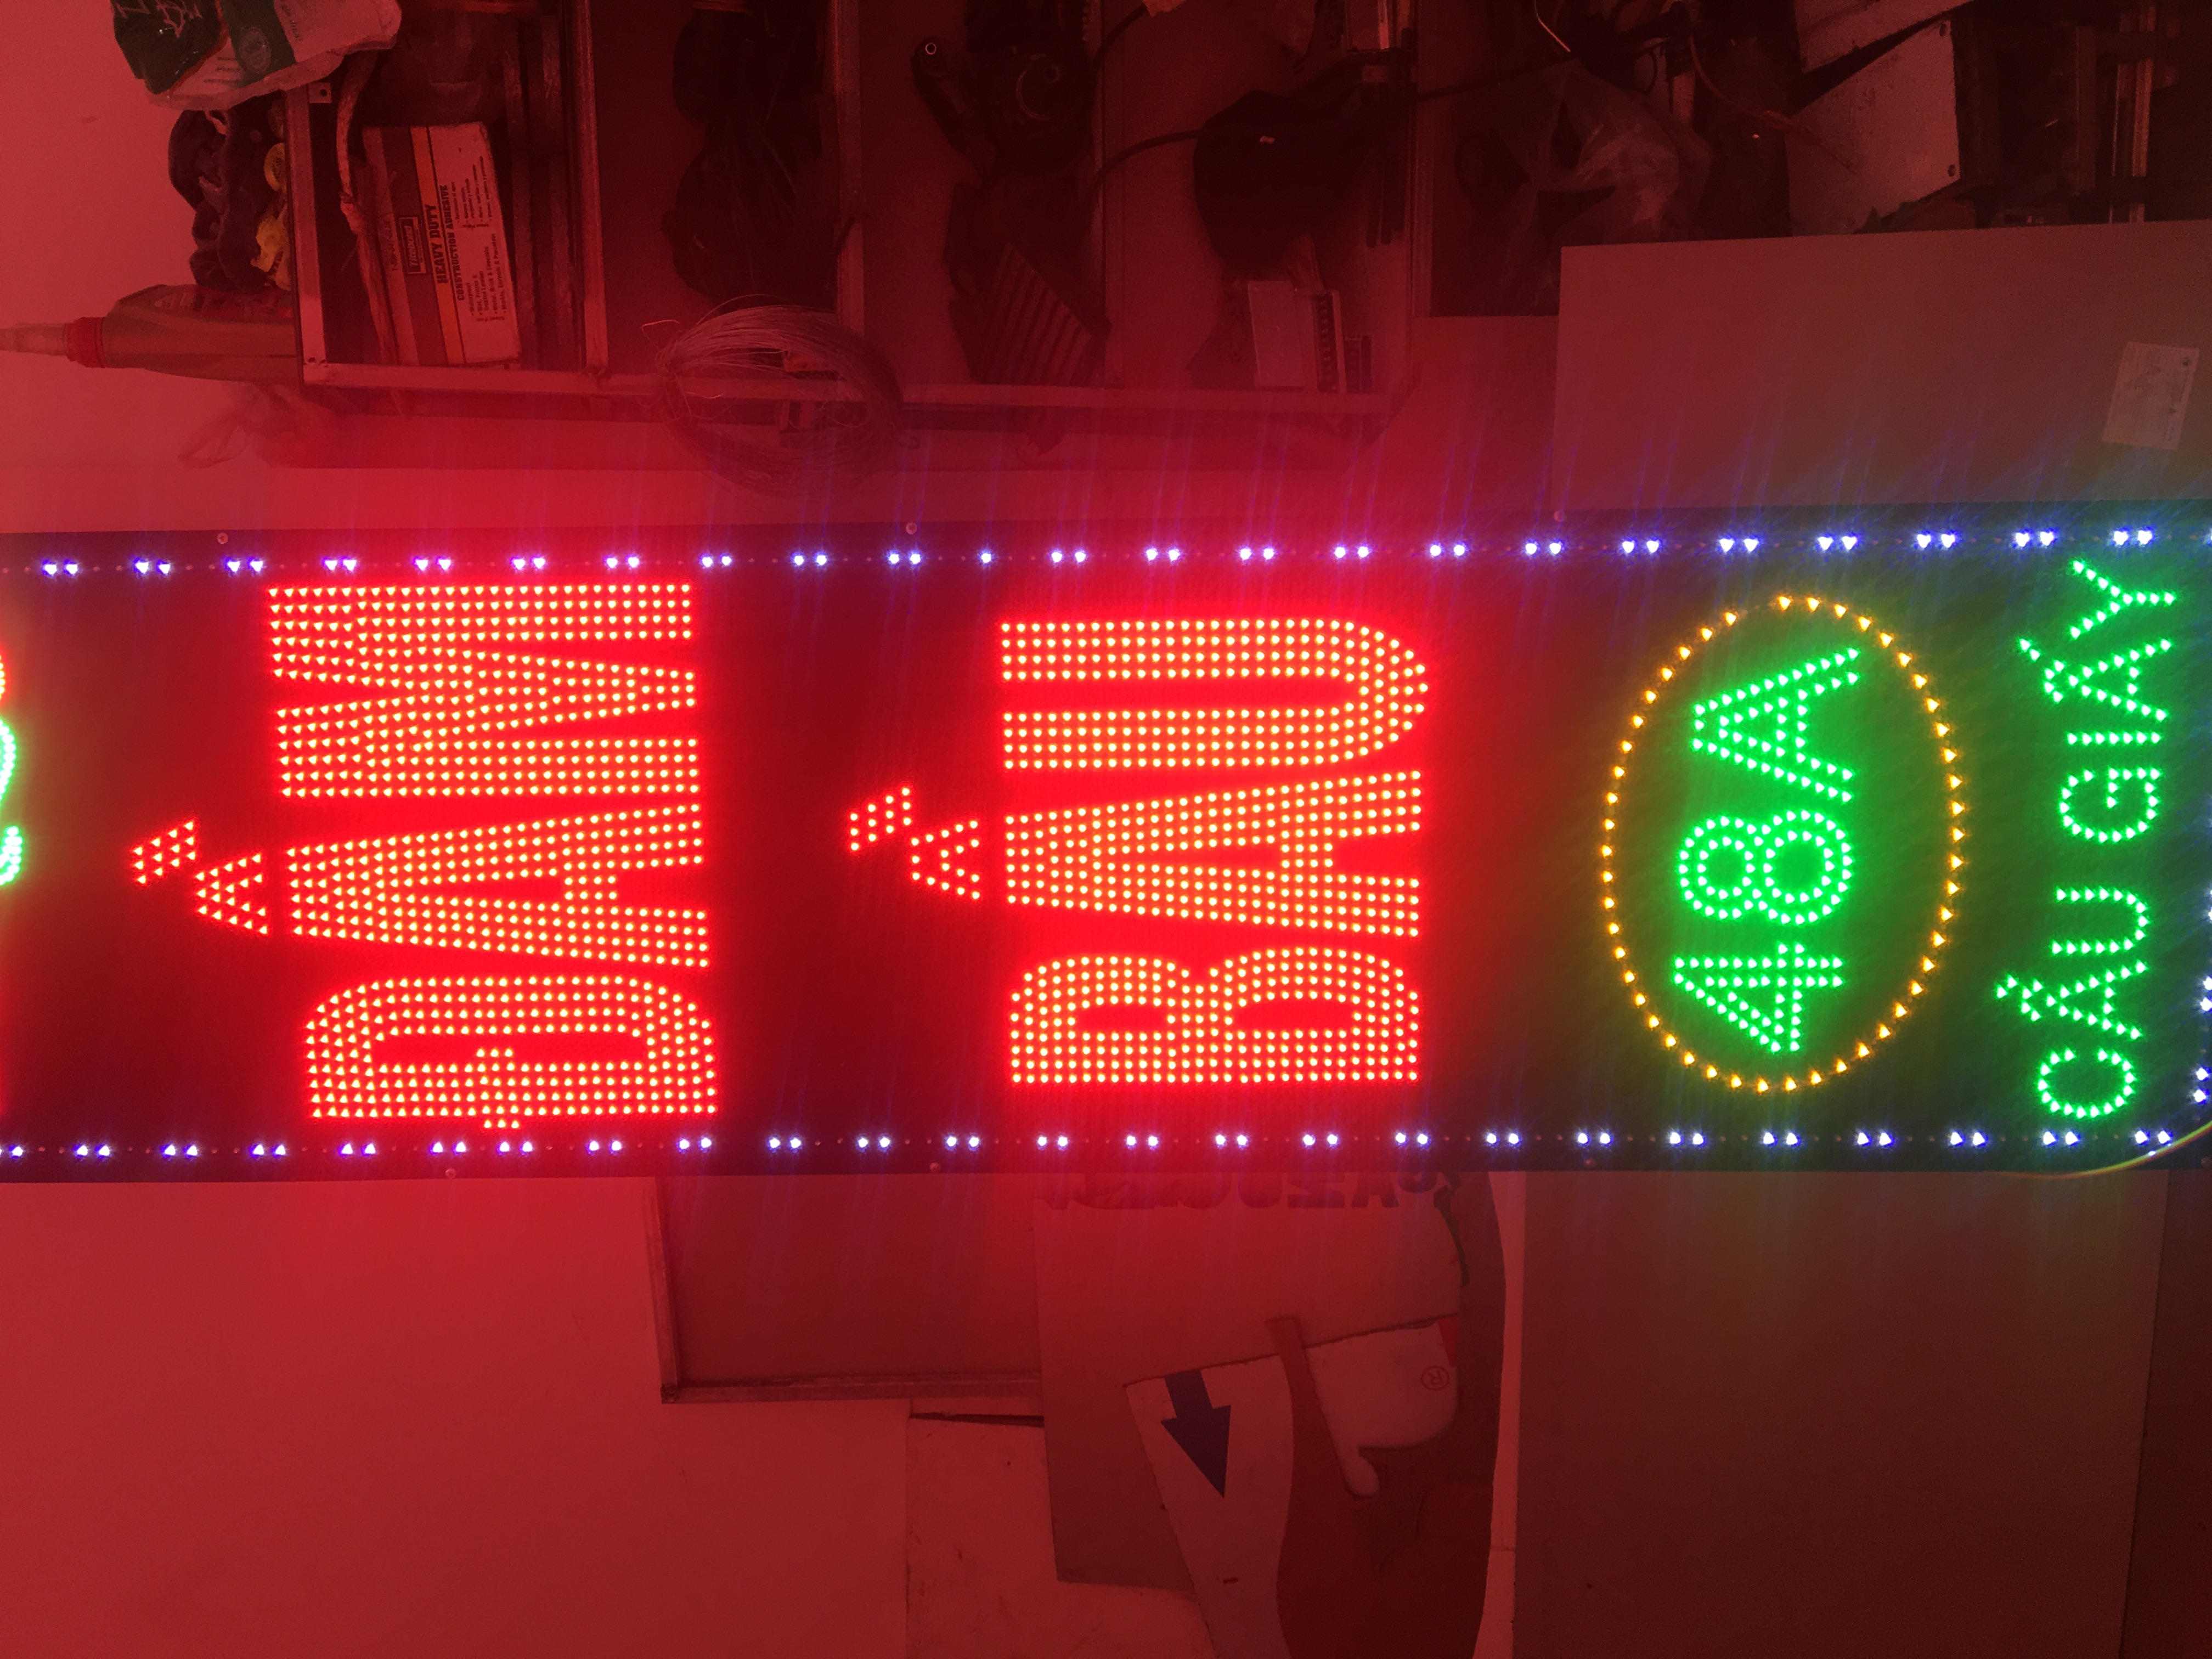 Biển LED vẫy đầm bầu, bien led vay dam bau